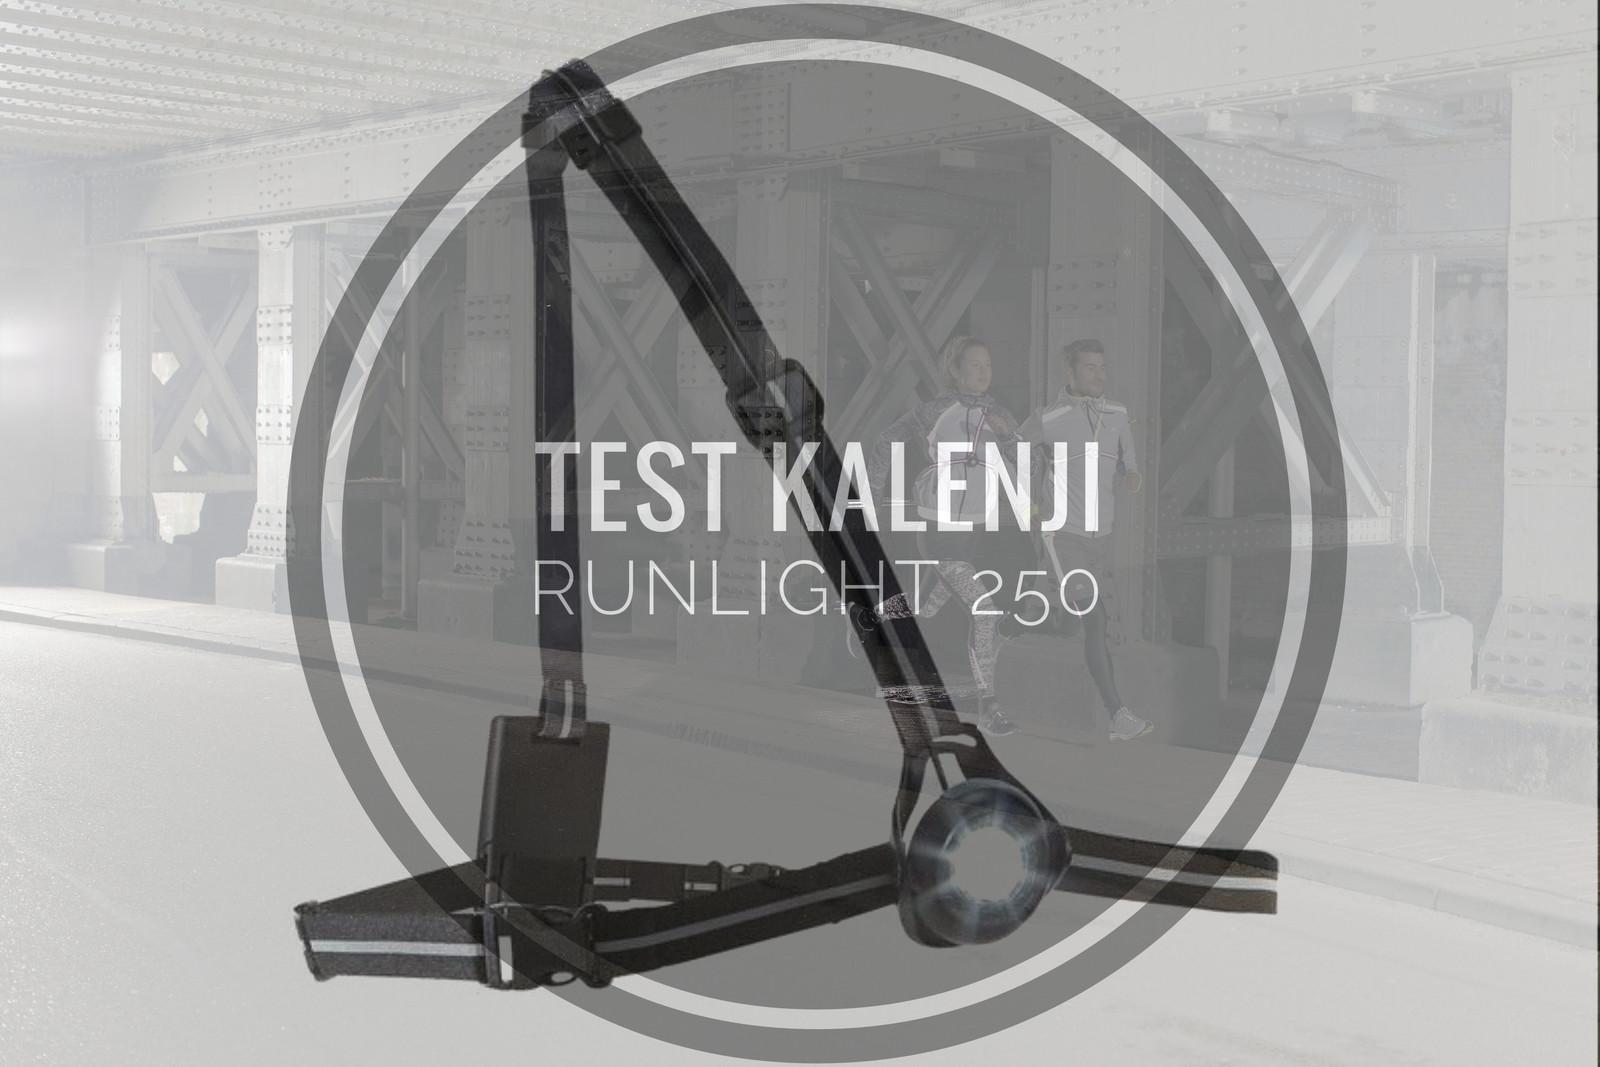 Test Light Run De Kalenji La 250 sBdxtChorQ